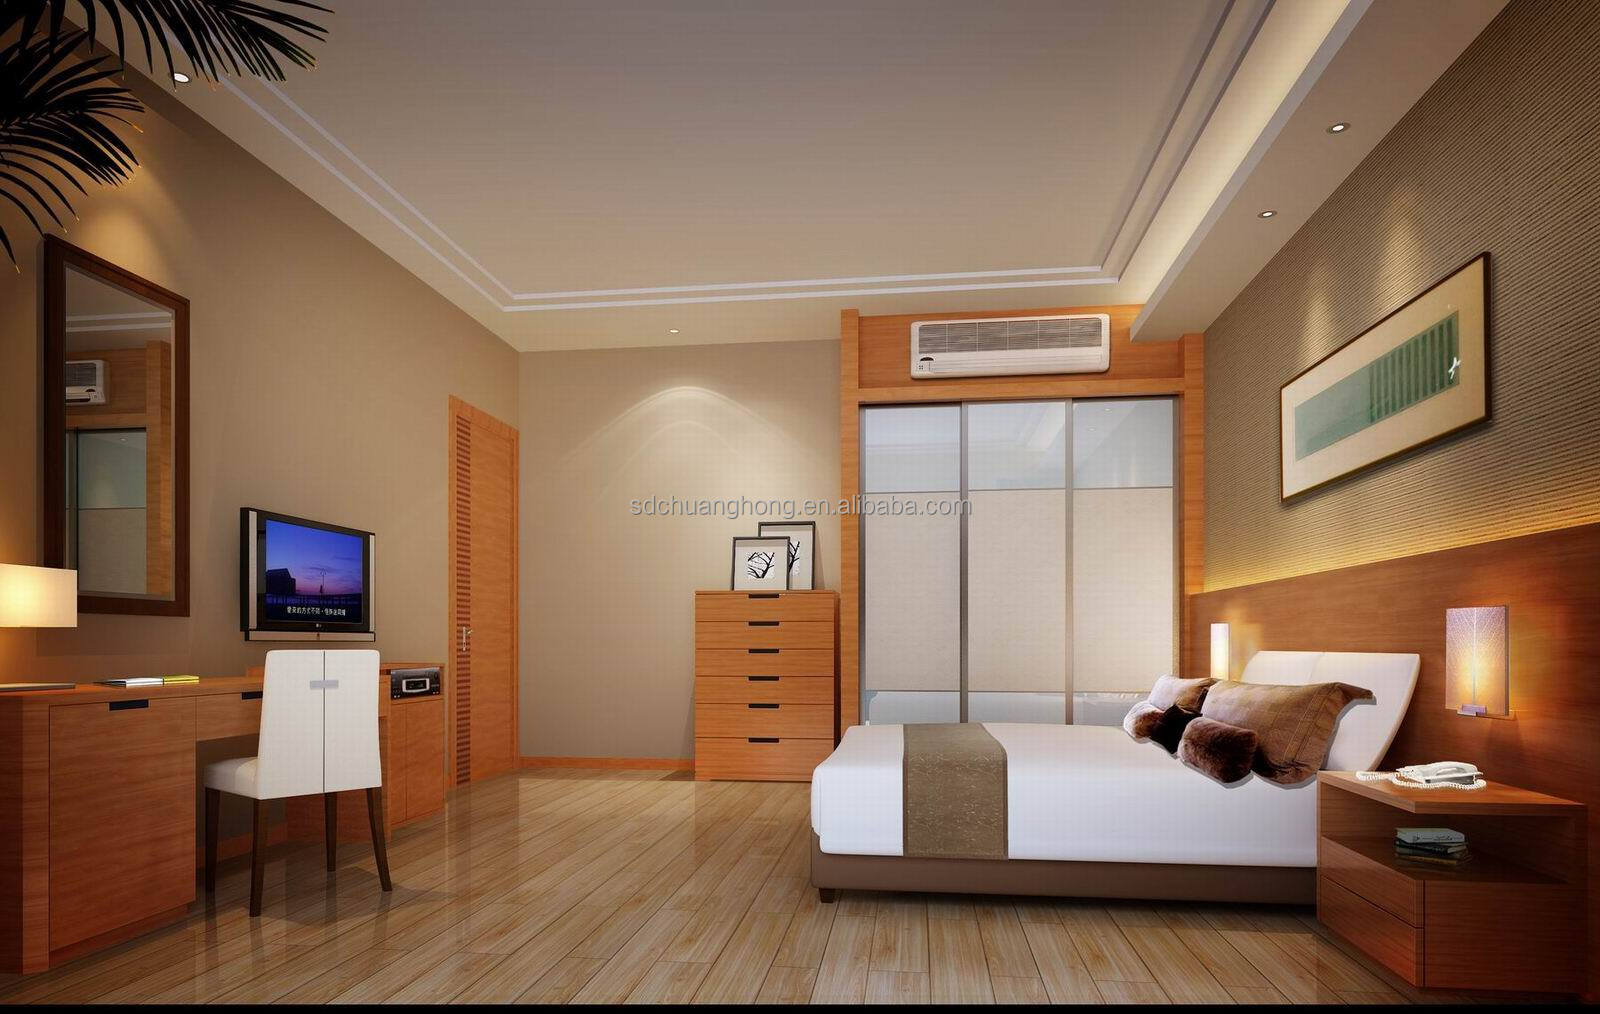 High End Hotel Project Furniture   Buy Modern Design Hotel Furniture .